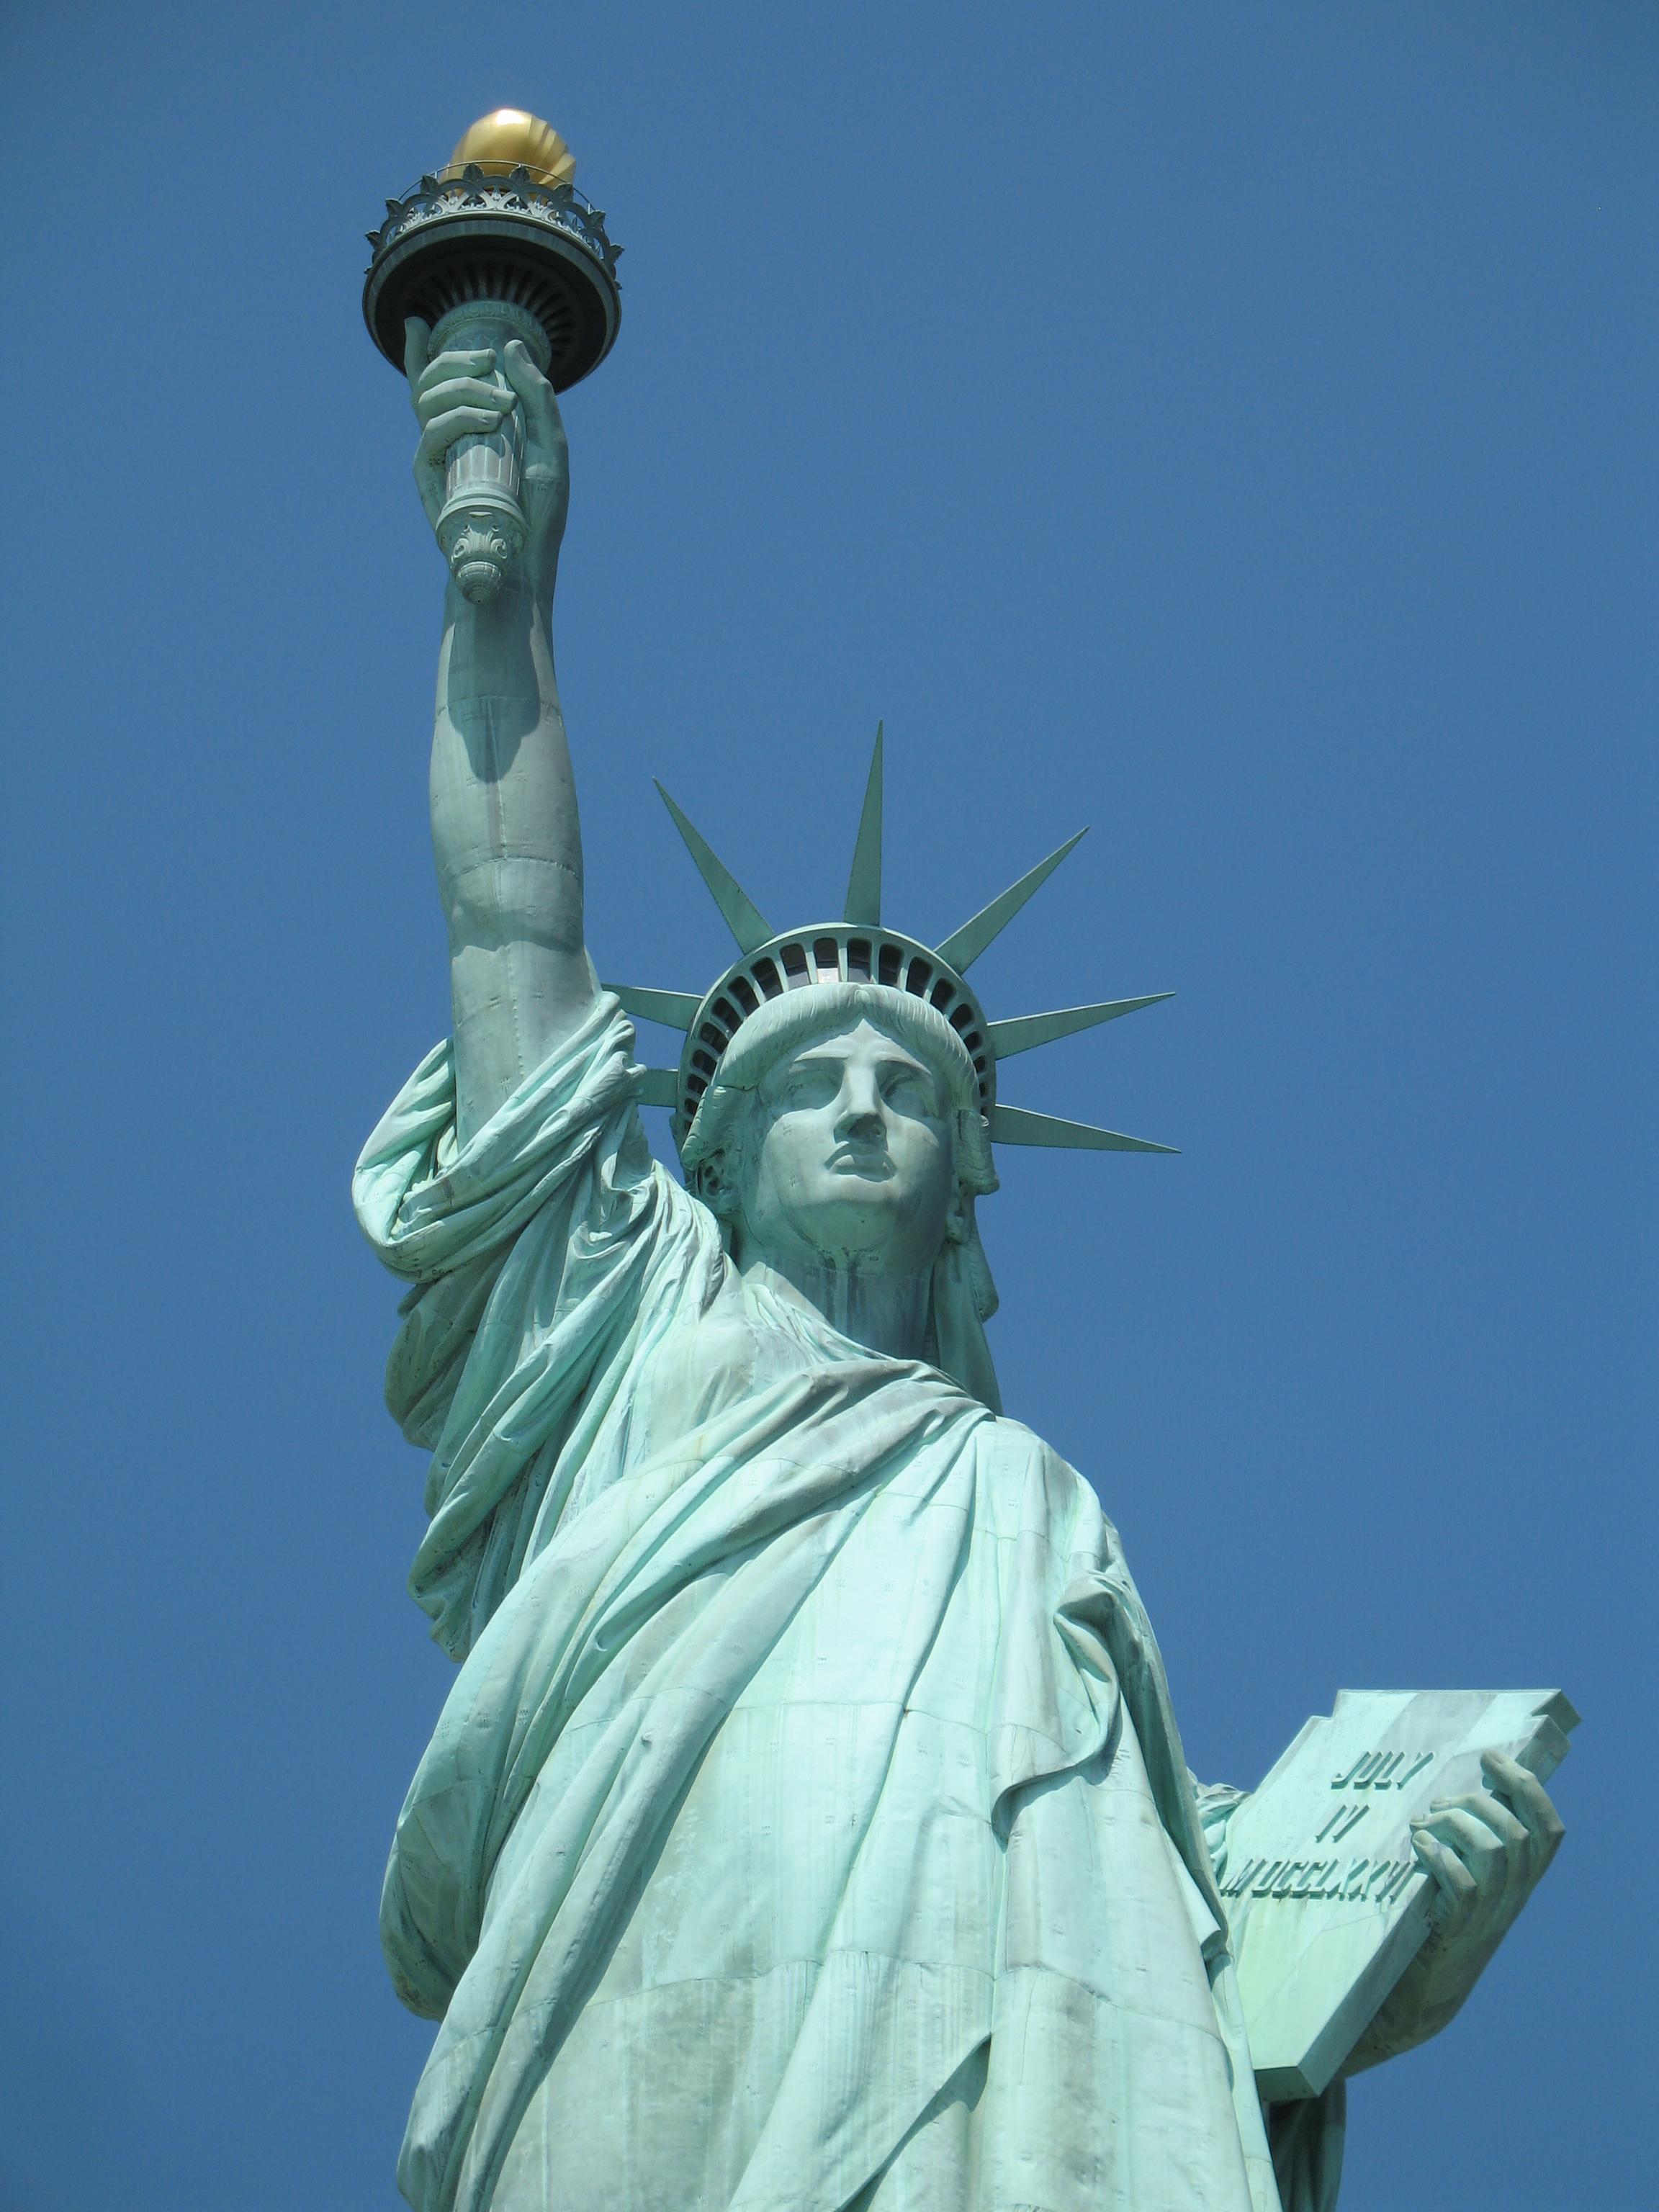 ouest usa 2011  u00bb archives  u00bb statue de la libert u00e9